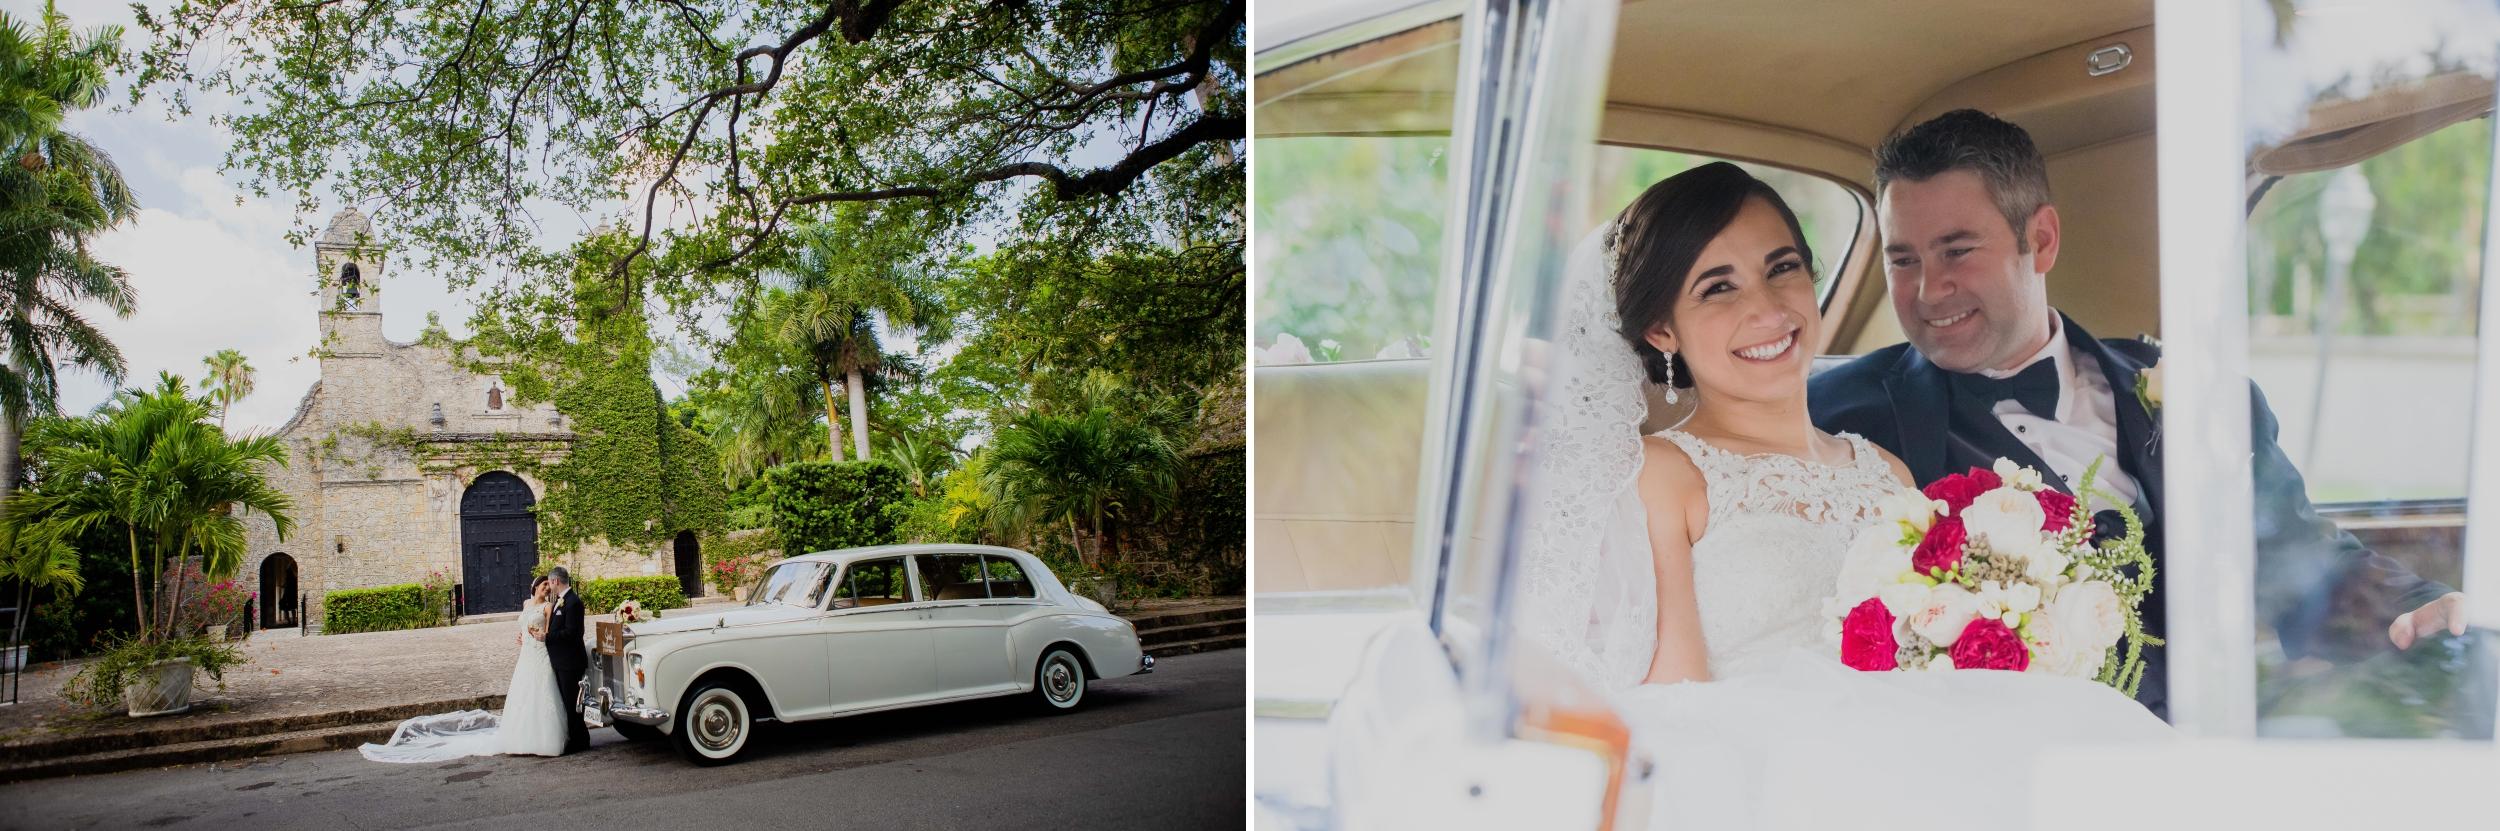 Wedding Hotel Colonnade Coral Gables - Santy Martinez 24.jpg